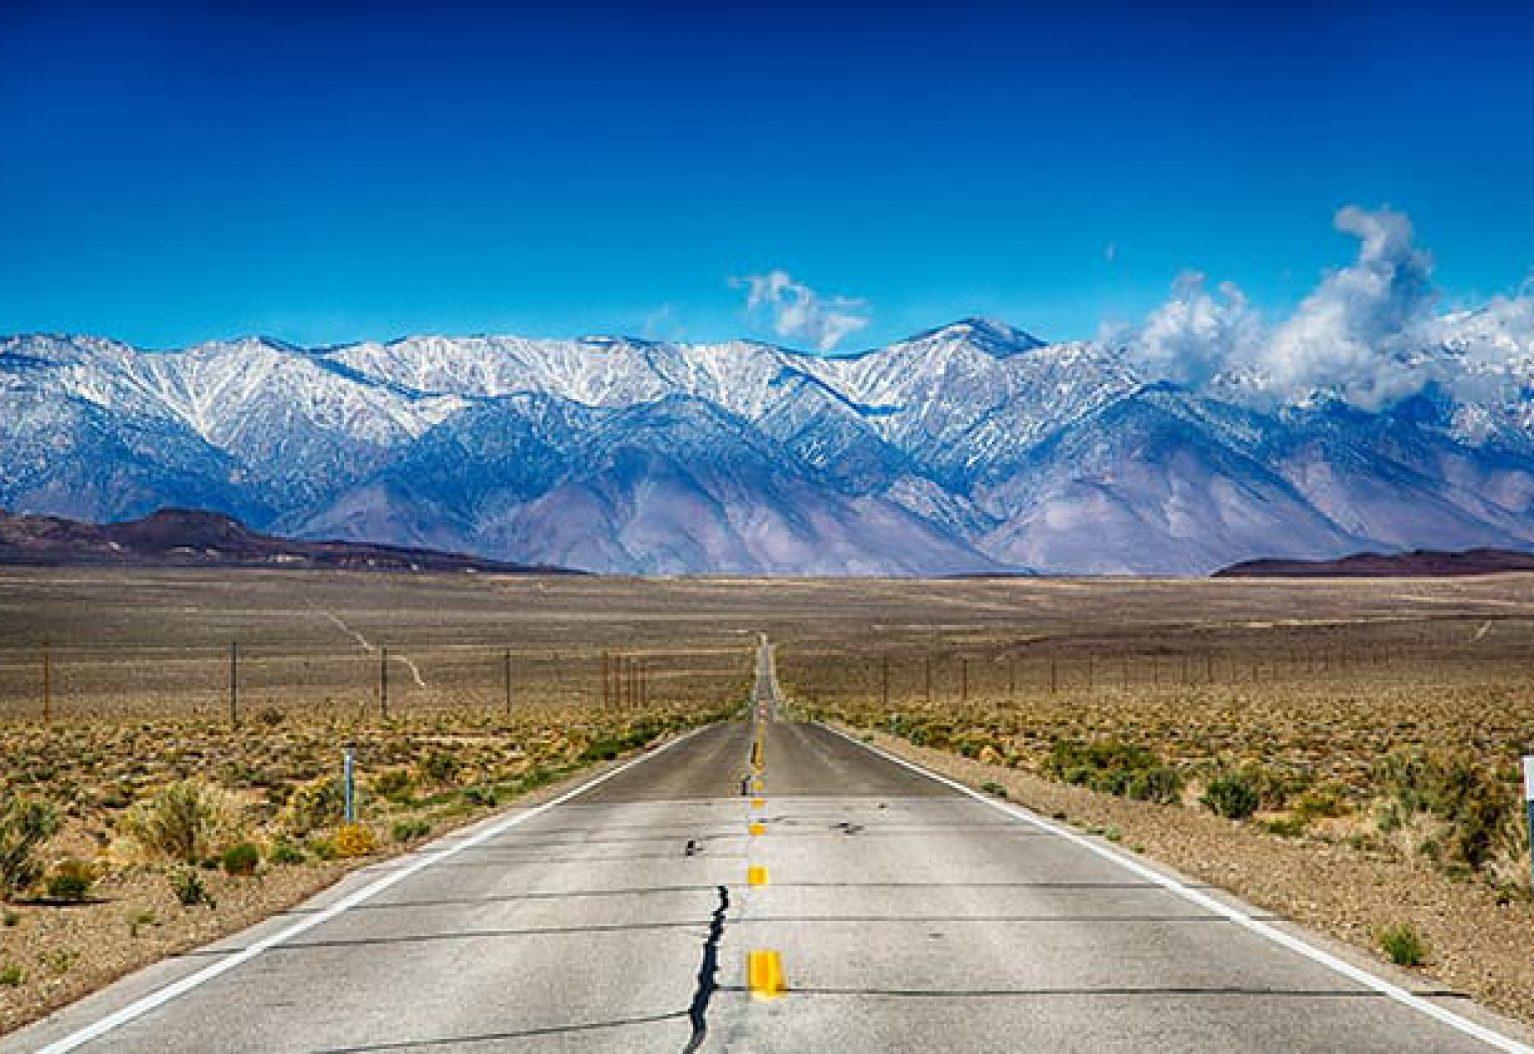 Road Tripping along the Eastern Sierra Nevada Mountain Range